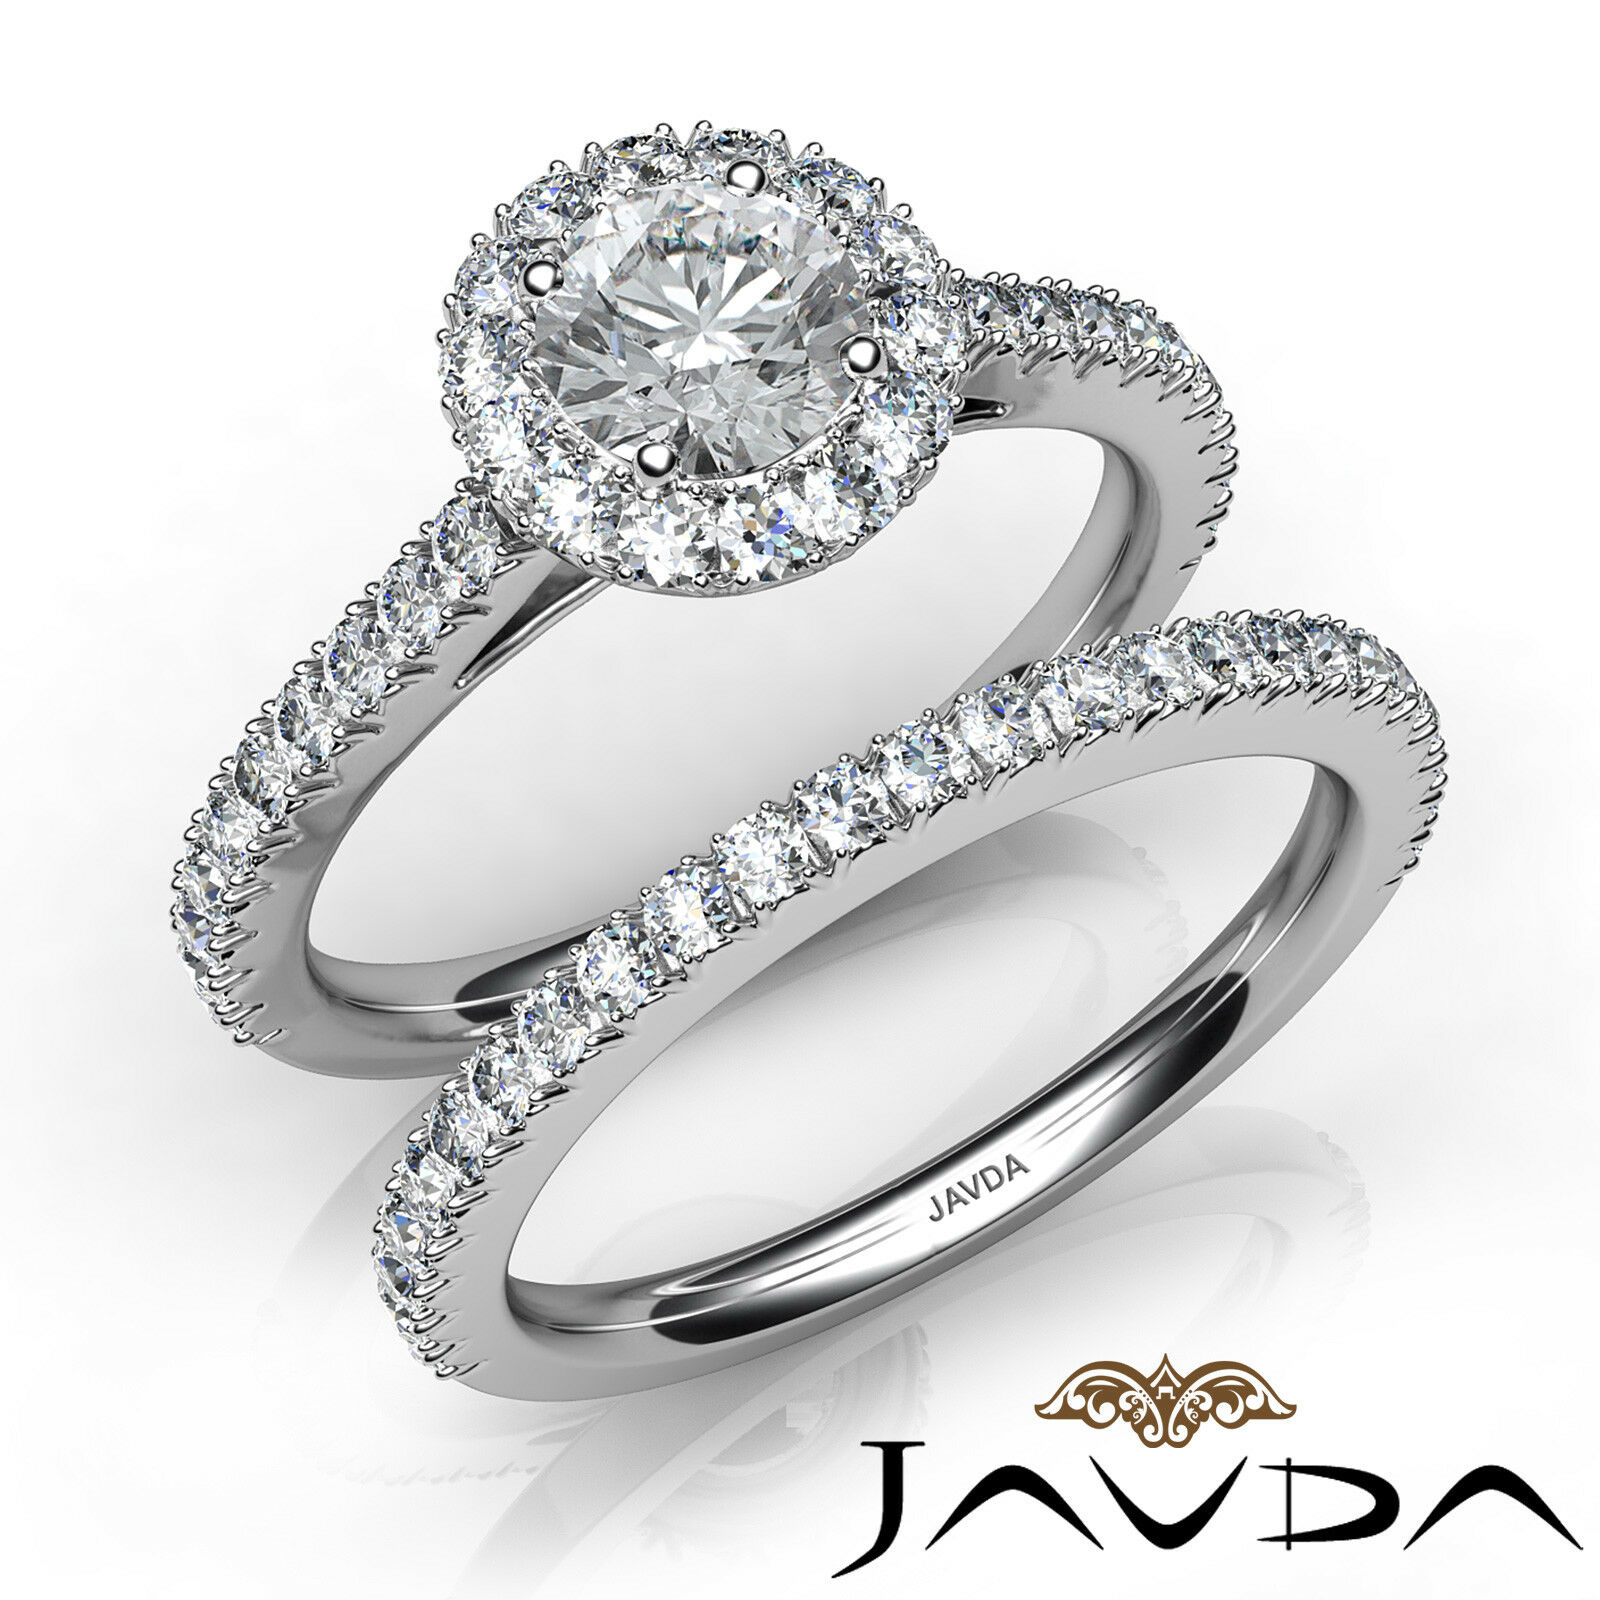 French Pave Round Diamond Bridal Engagement Ring GIA E VS1 14k White Gold 2ct